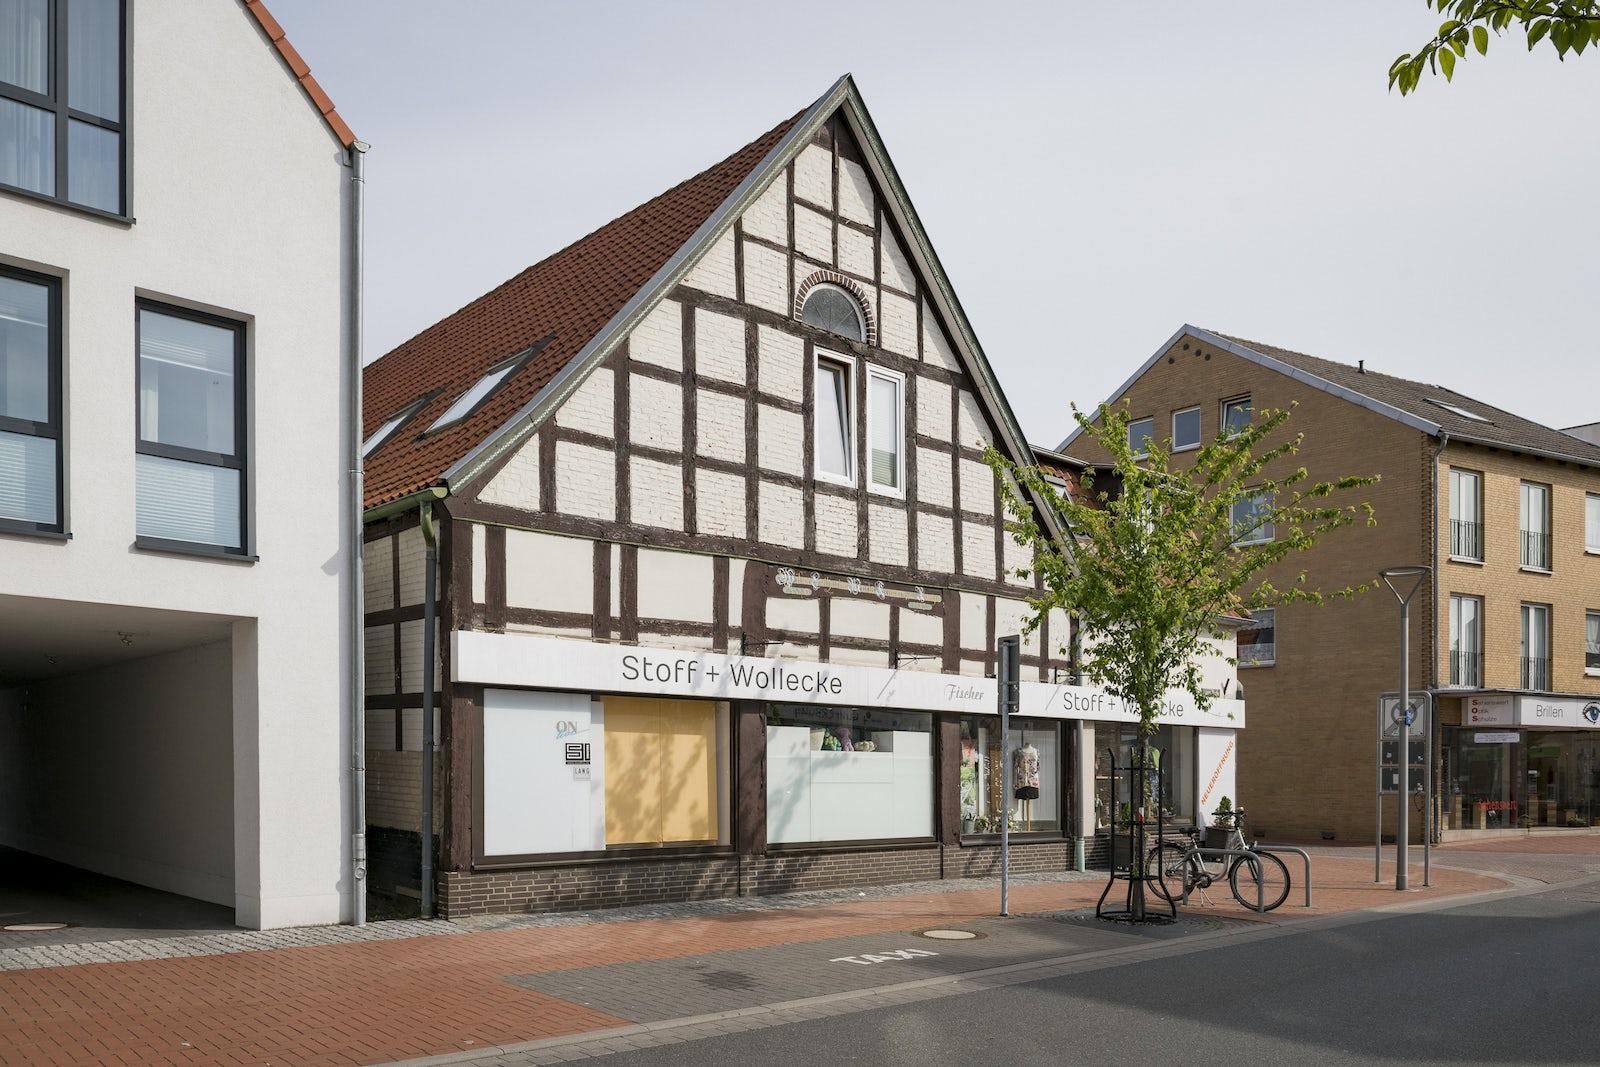 ffc32bc68b 8-Zimmer-Mehrfamilienhaus, 482 m² in Wunstorf | Homeday